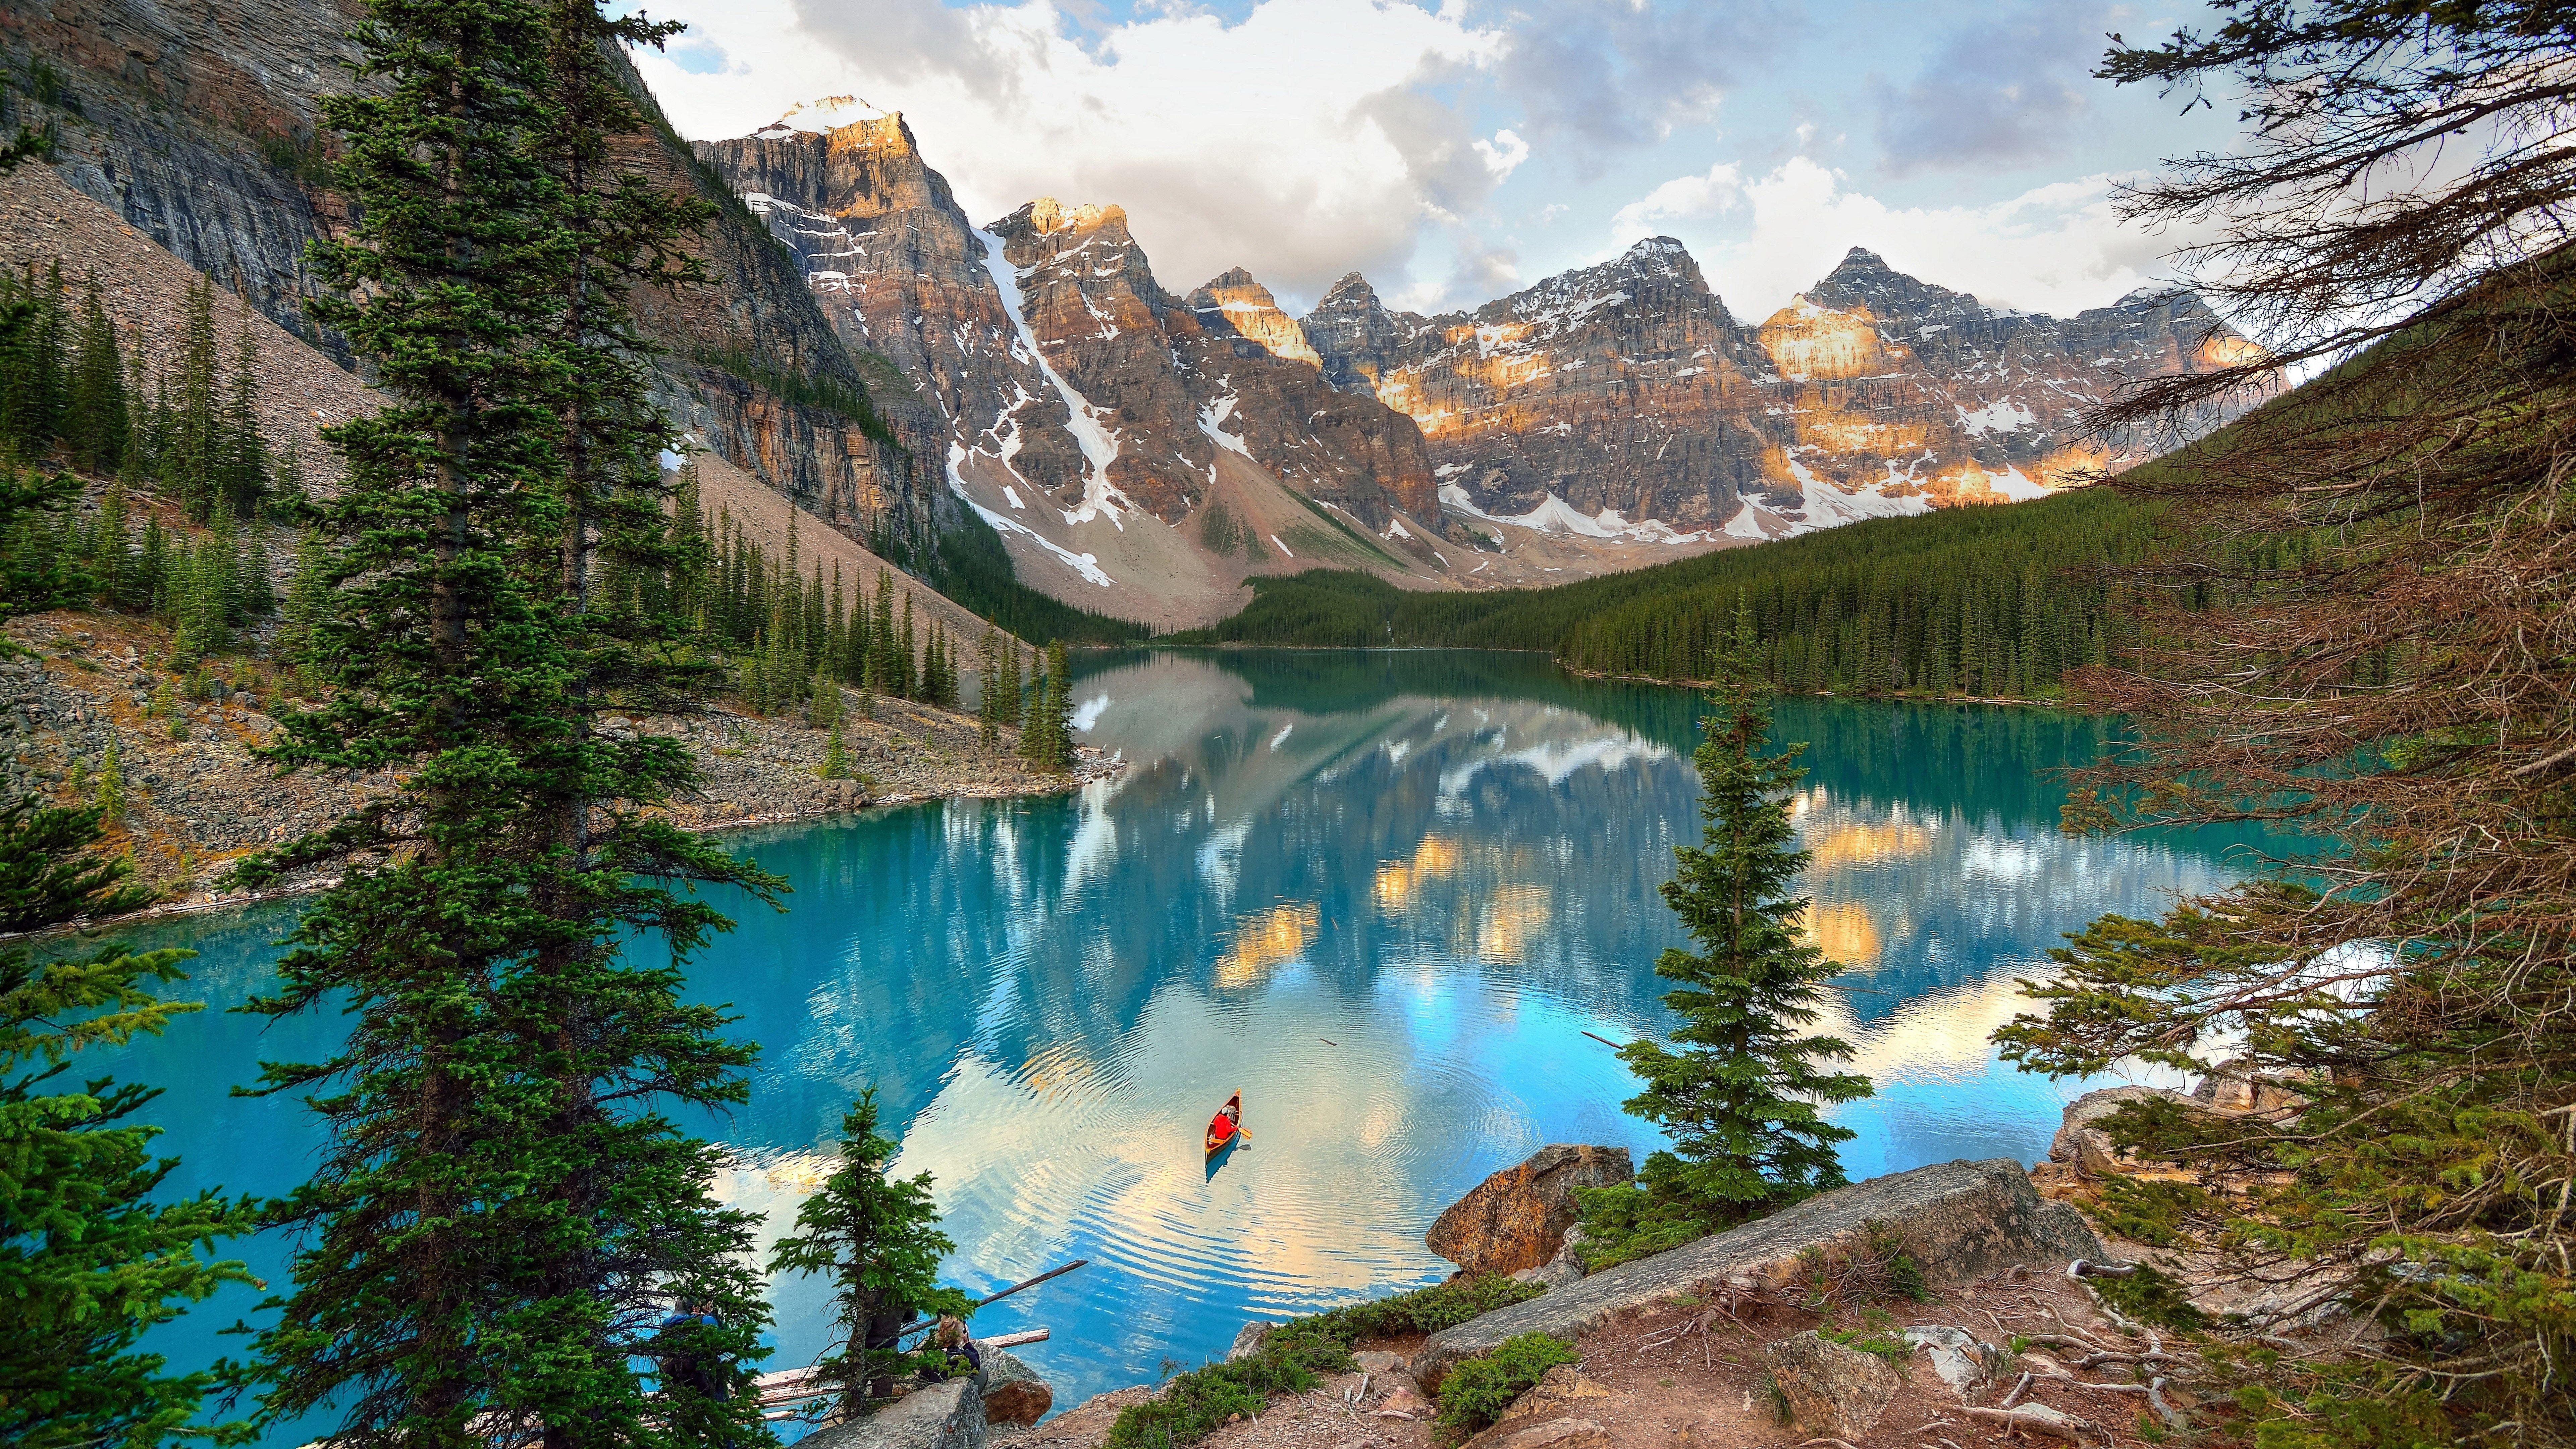 8k mountain wallpapers top free 8k mountain backgrounds - Nature wallpaper 8k ...